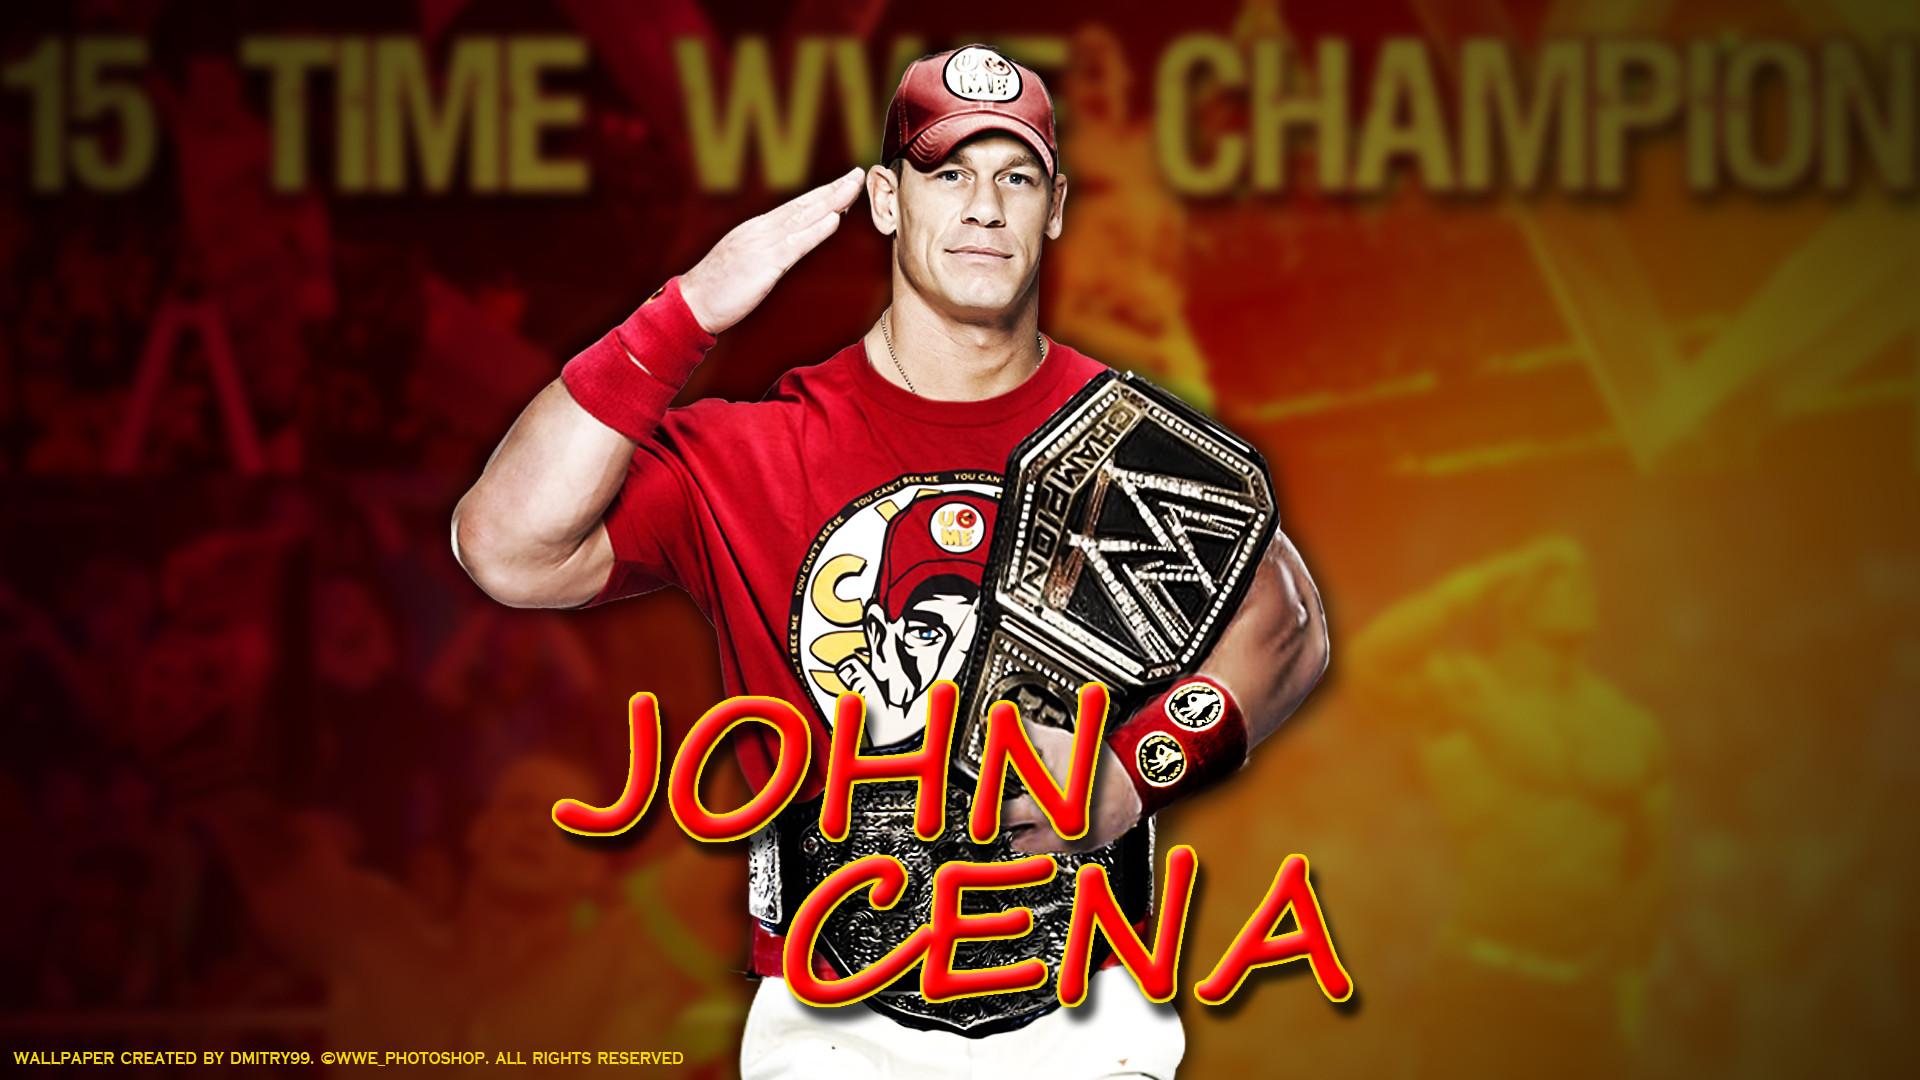 johncena – Google Search   John Cena   Pinterest   John cena and Wwe  superstars